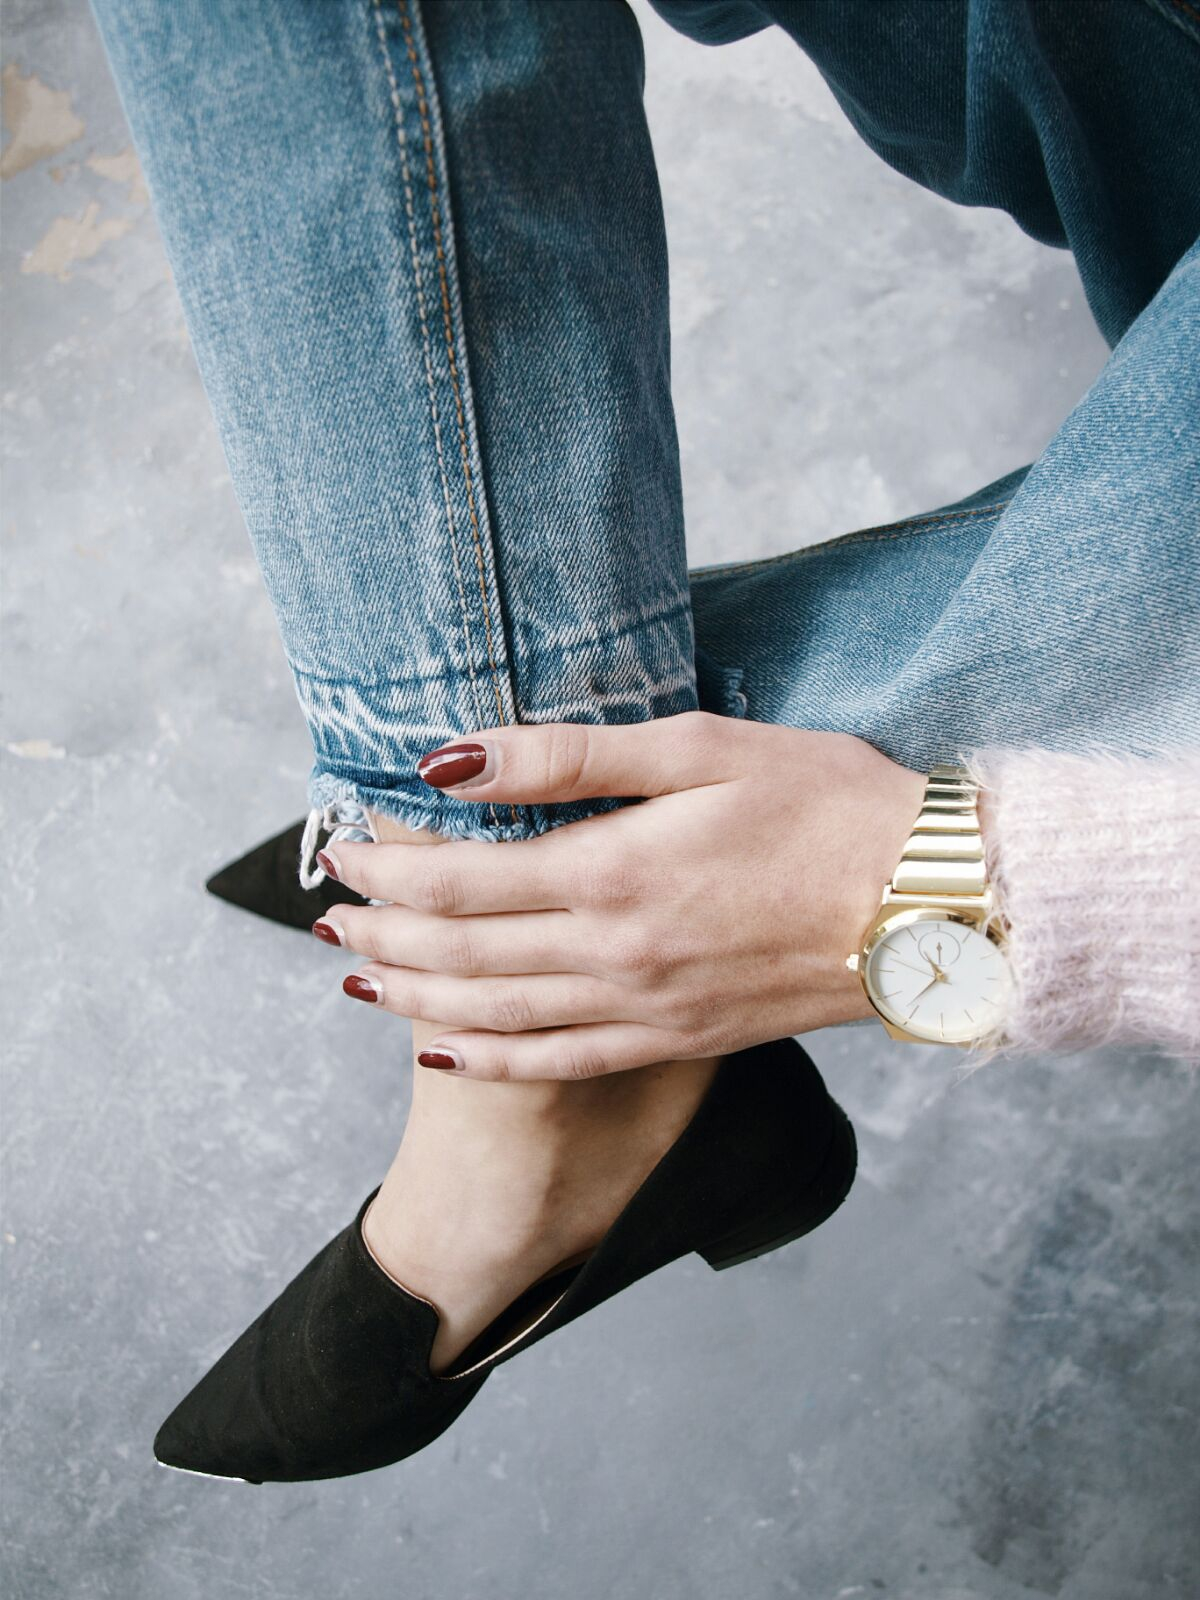 nail-conturing-coastalandco-minimal-manucure-manicure-beauty-beaute-belleza-manicura-beige-white-nude-sephora-kiko-mac-nars